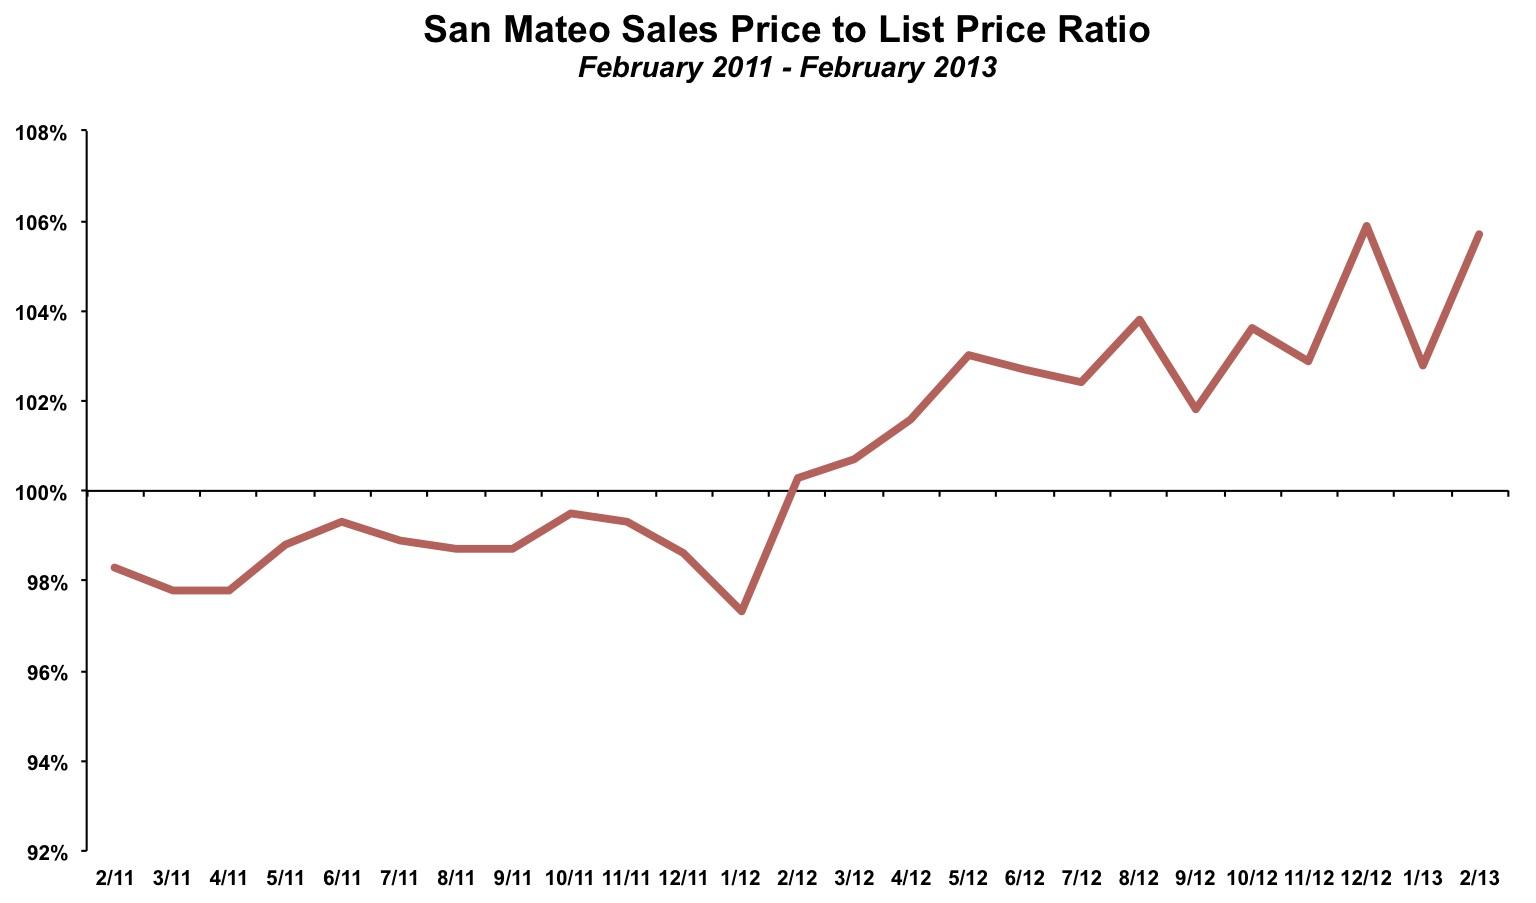 San Mateo Sales Price List Price February 2013